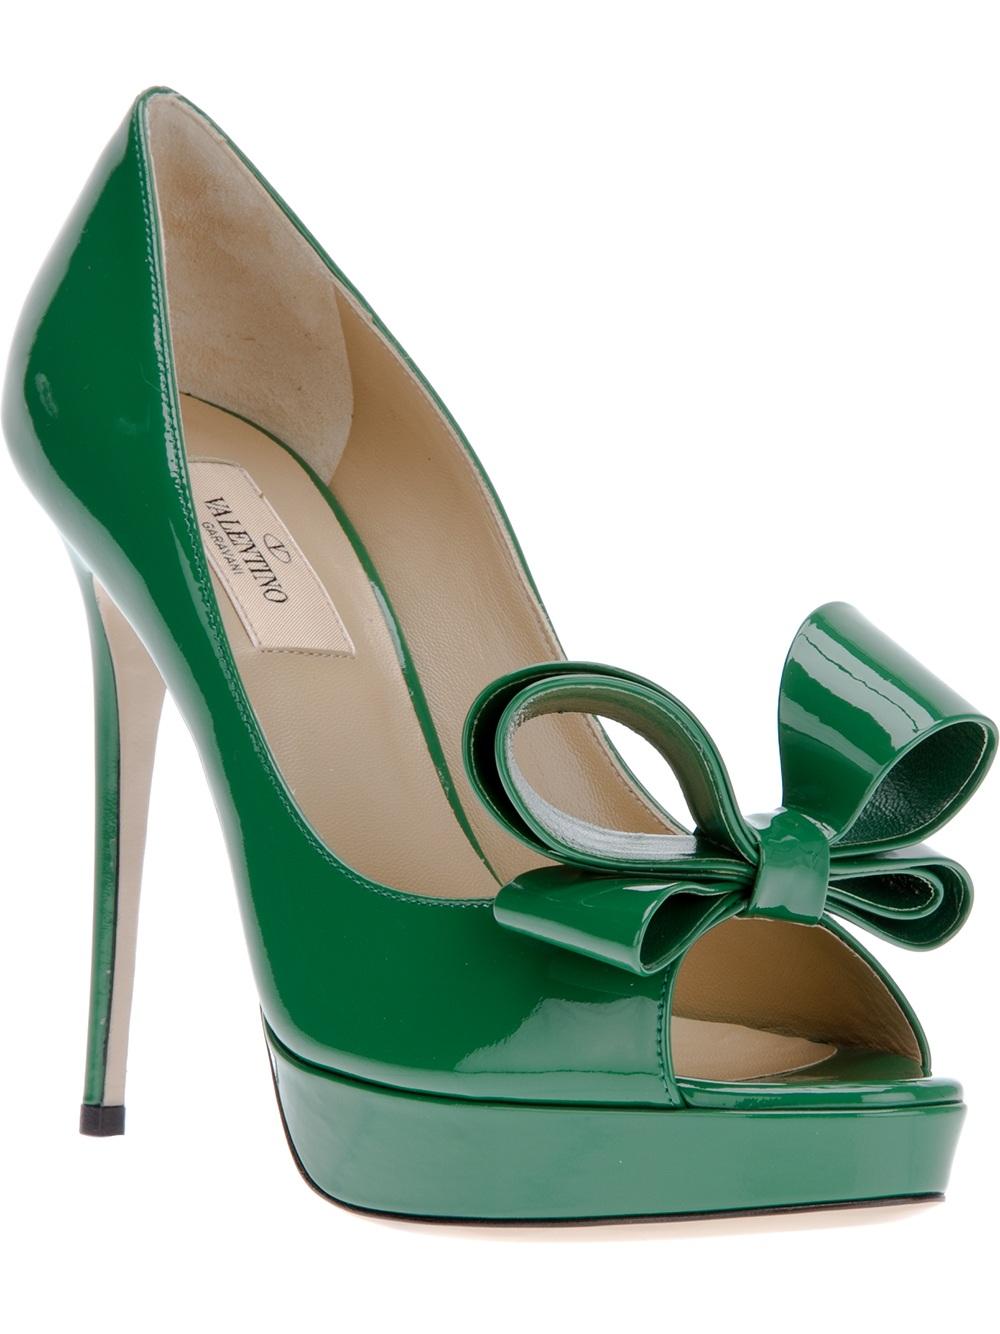 Valentino Peep Toe Pump In Green | Lyst